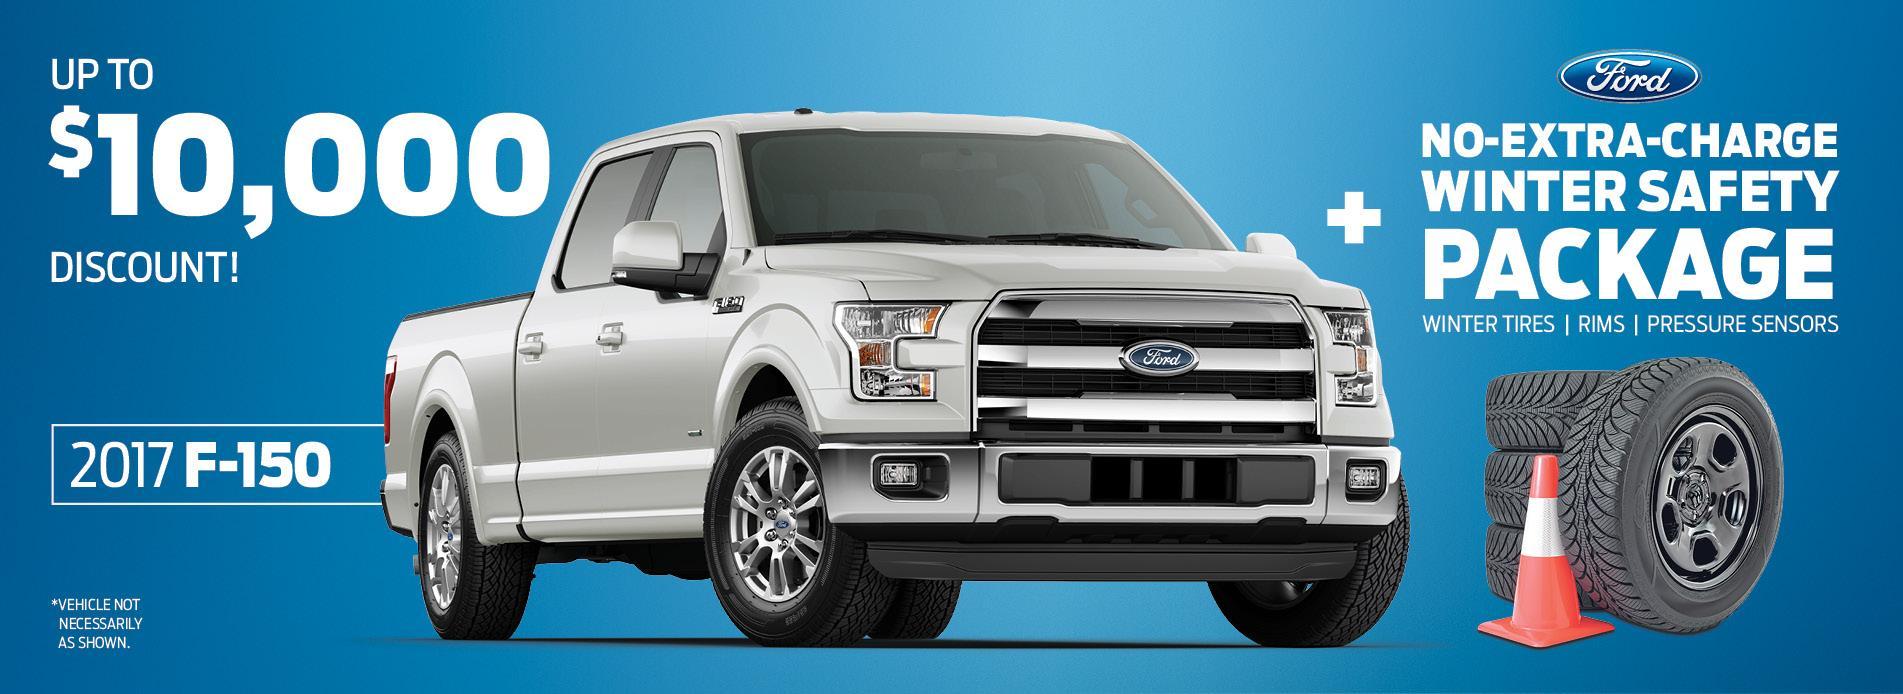 2017 F-150 $10,000 rebate Desjardins Ford